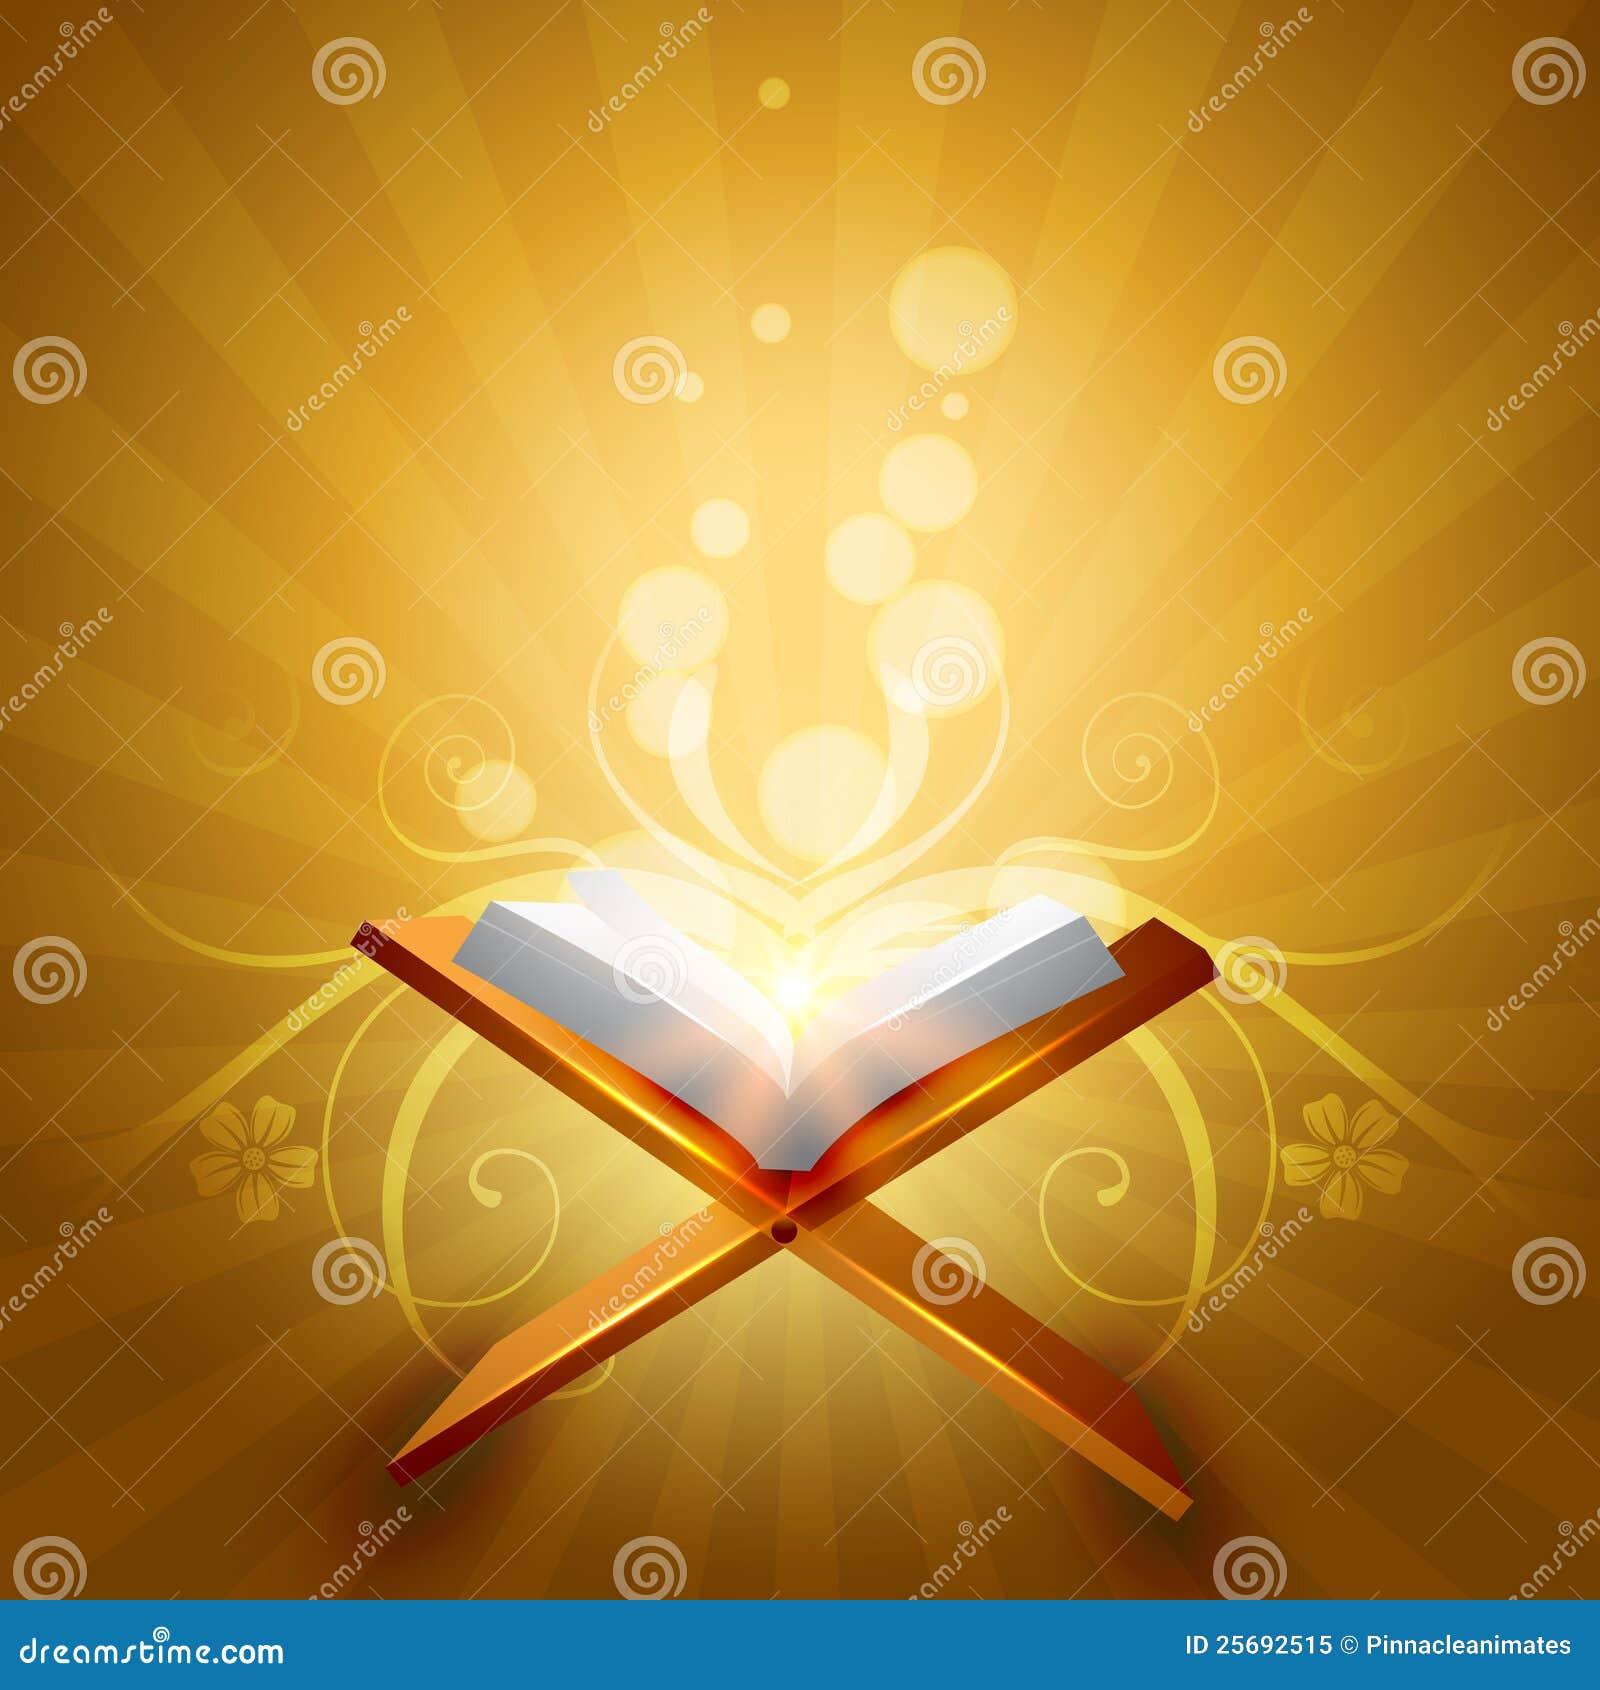 Citaten Quran Gratis : Quraan vector royalty free stock photo image